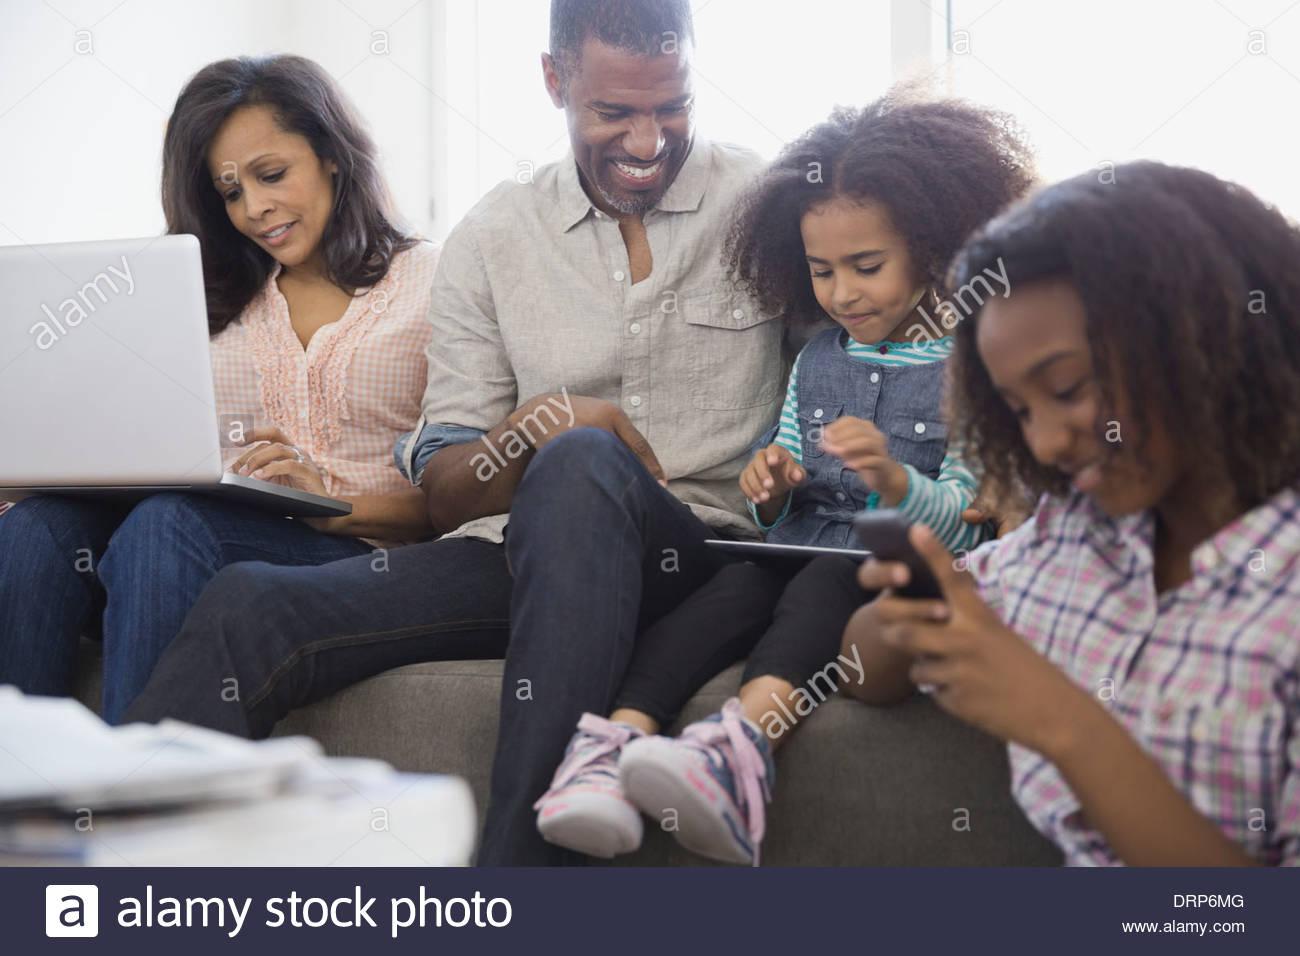 Familie mit drahtlosen Geräten zu Hause Stockbild